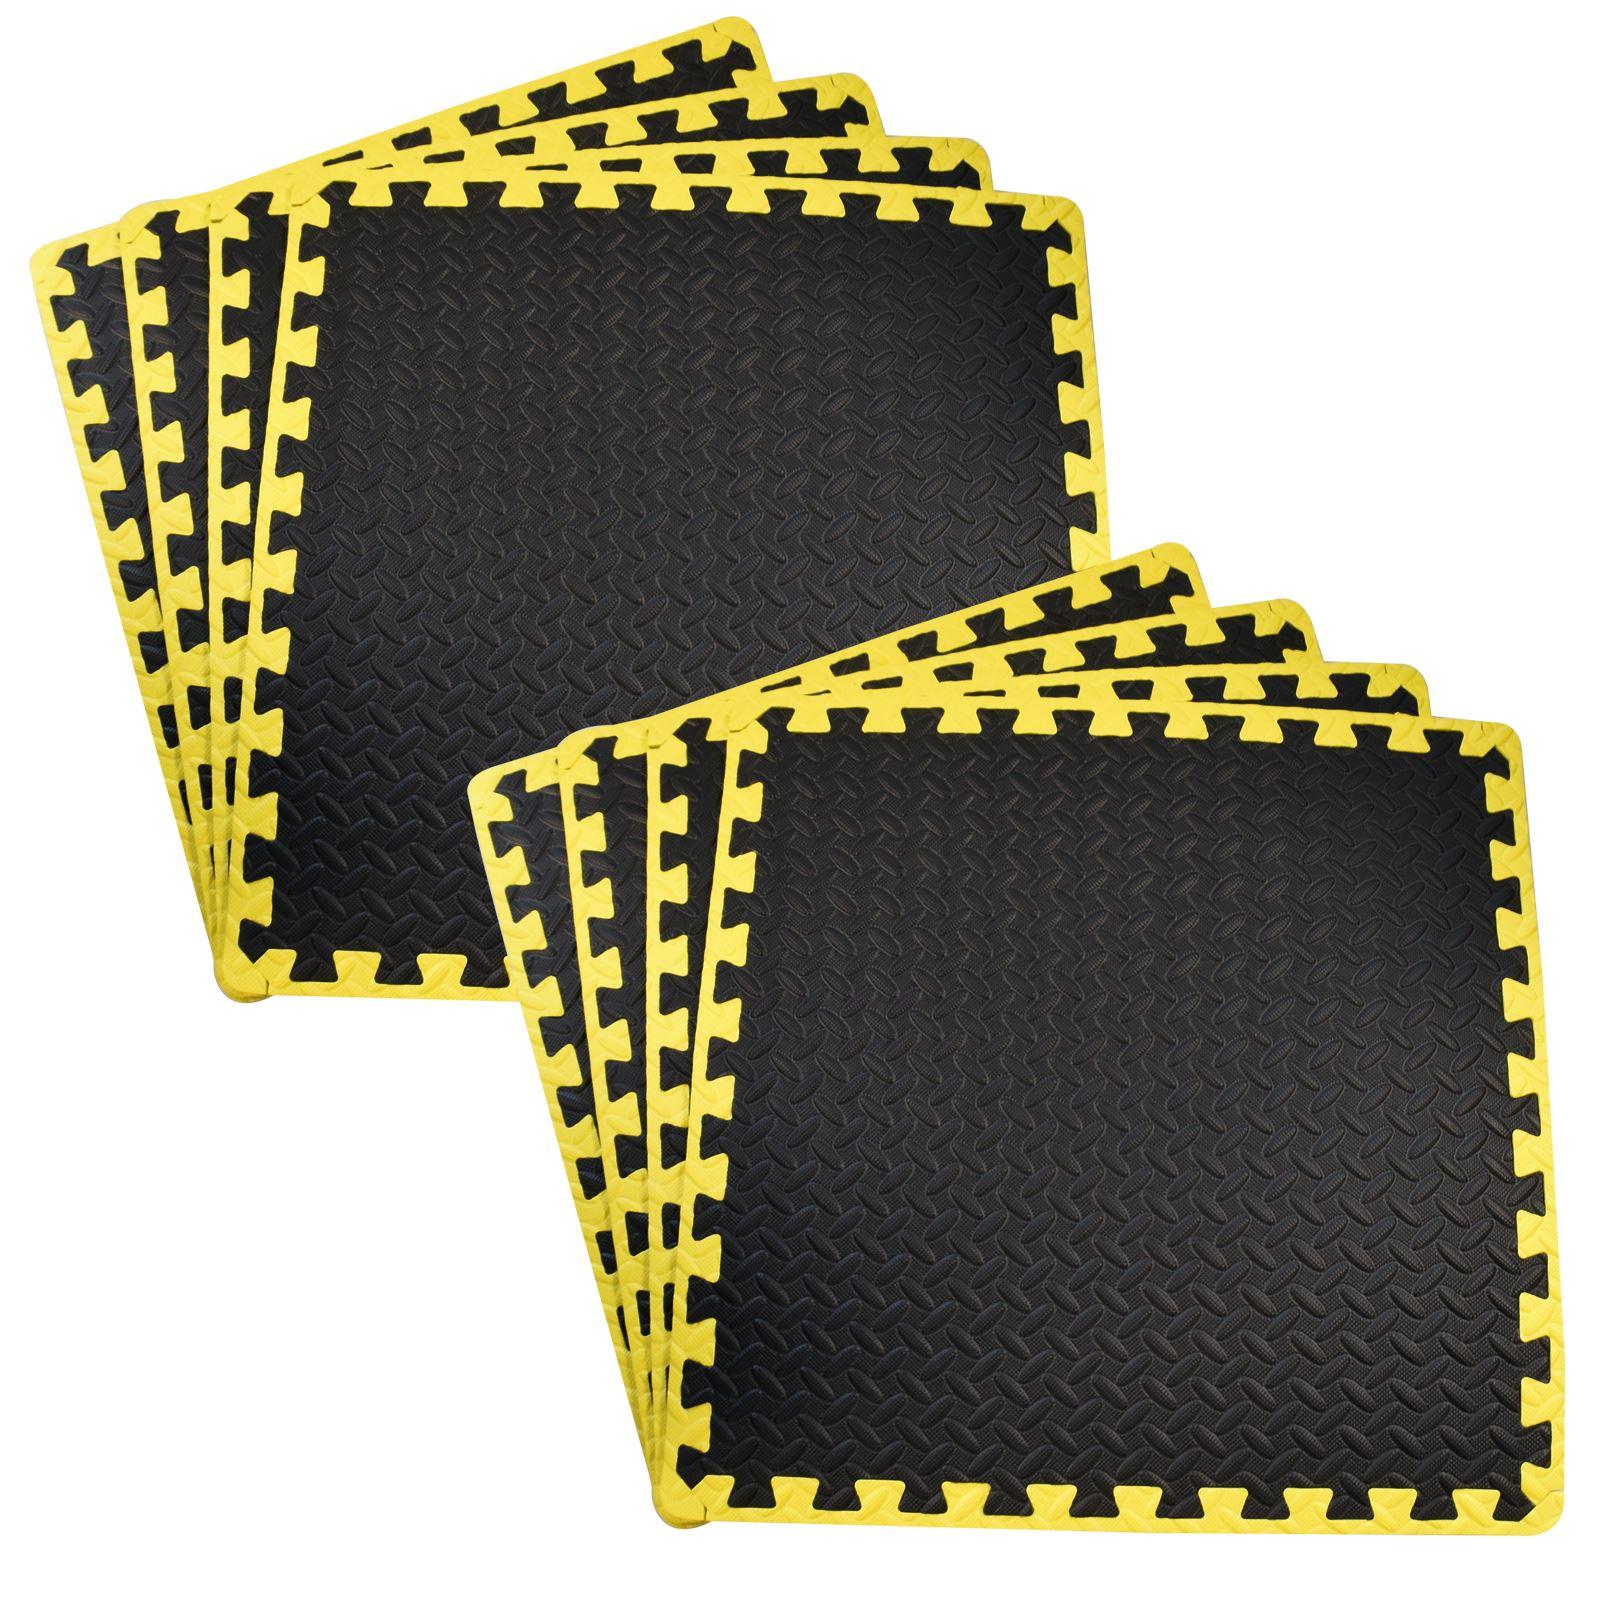 Interlocking eva floor mat soft rubber foam tiles exercise for Gimnasio 9 entre 40 y 41